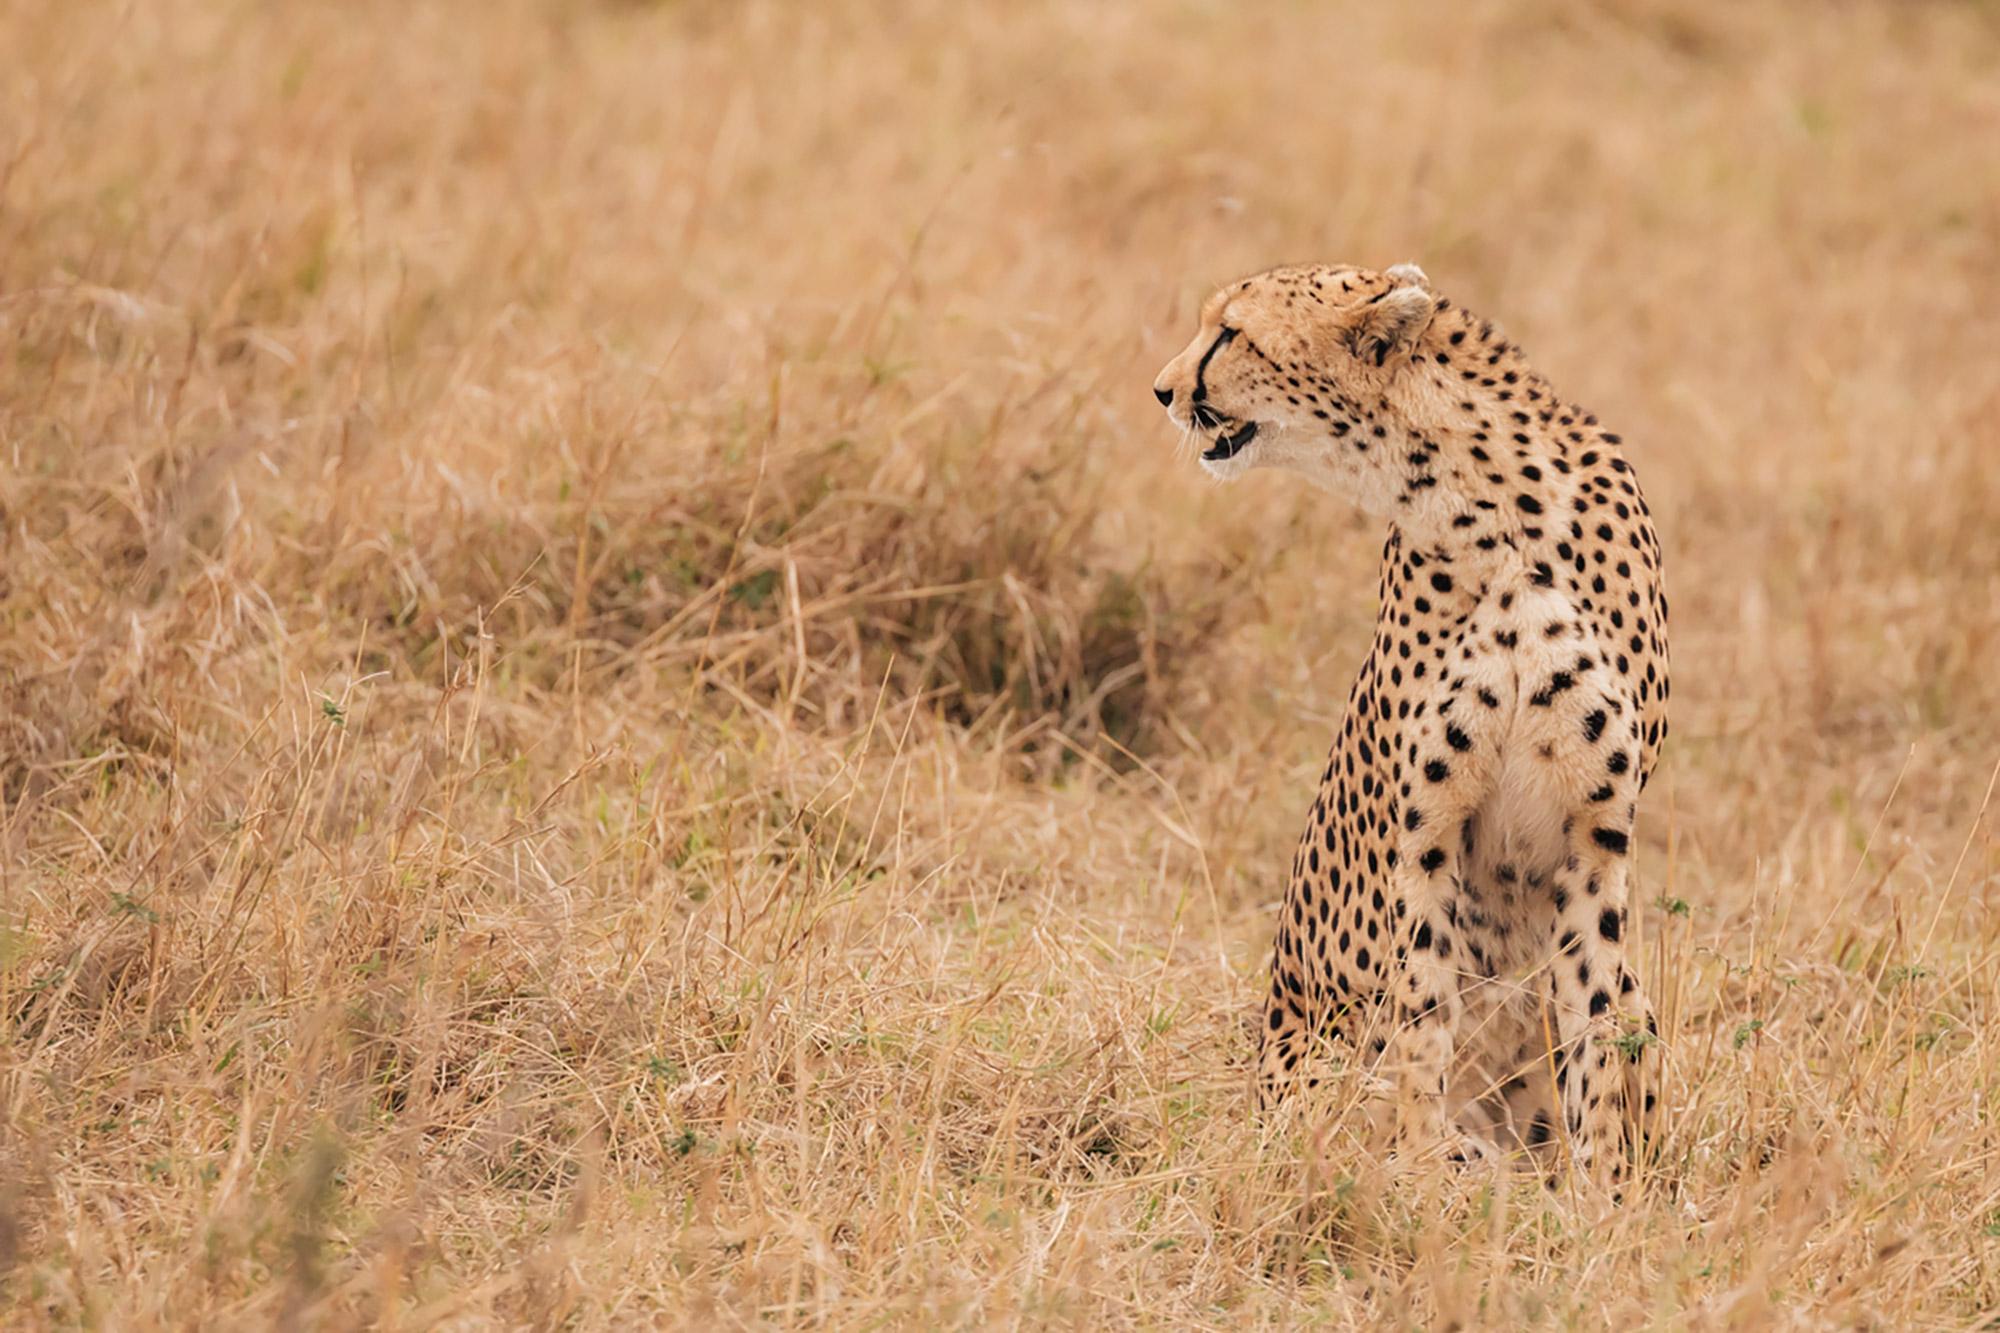 APitts_Condor_Kenya_092-2-2.jpg